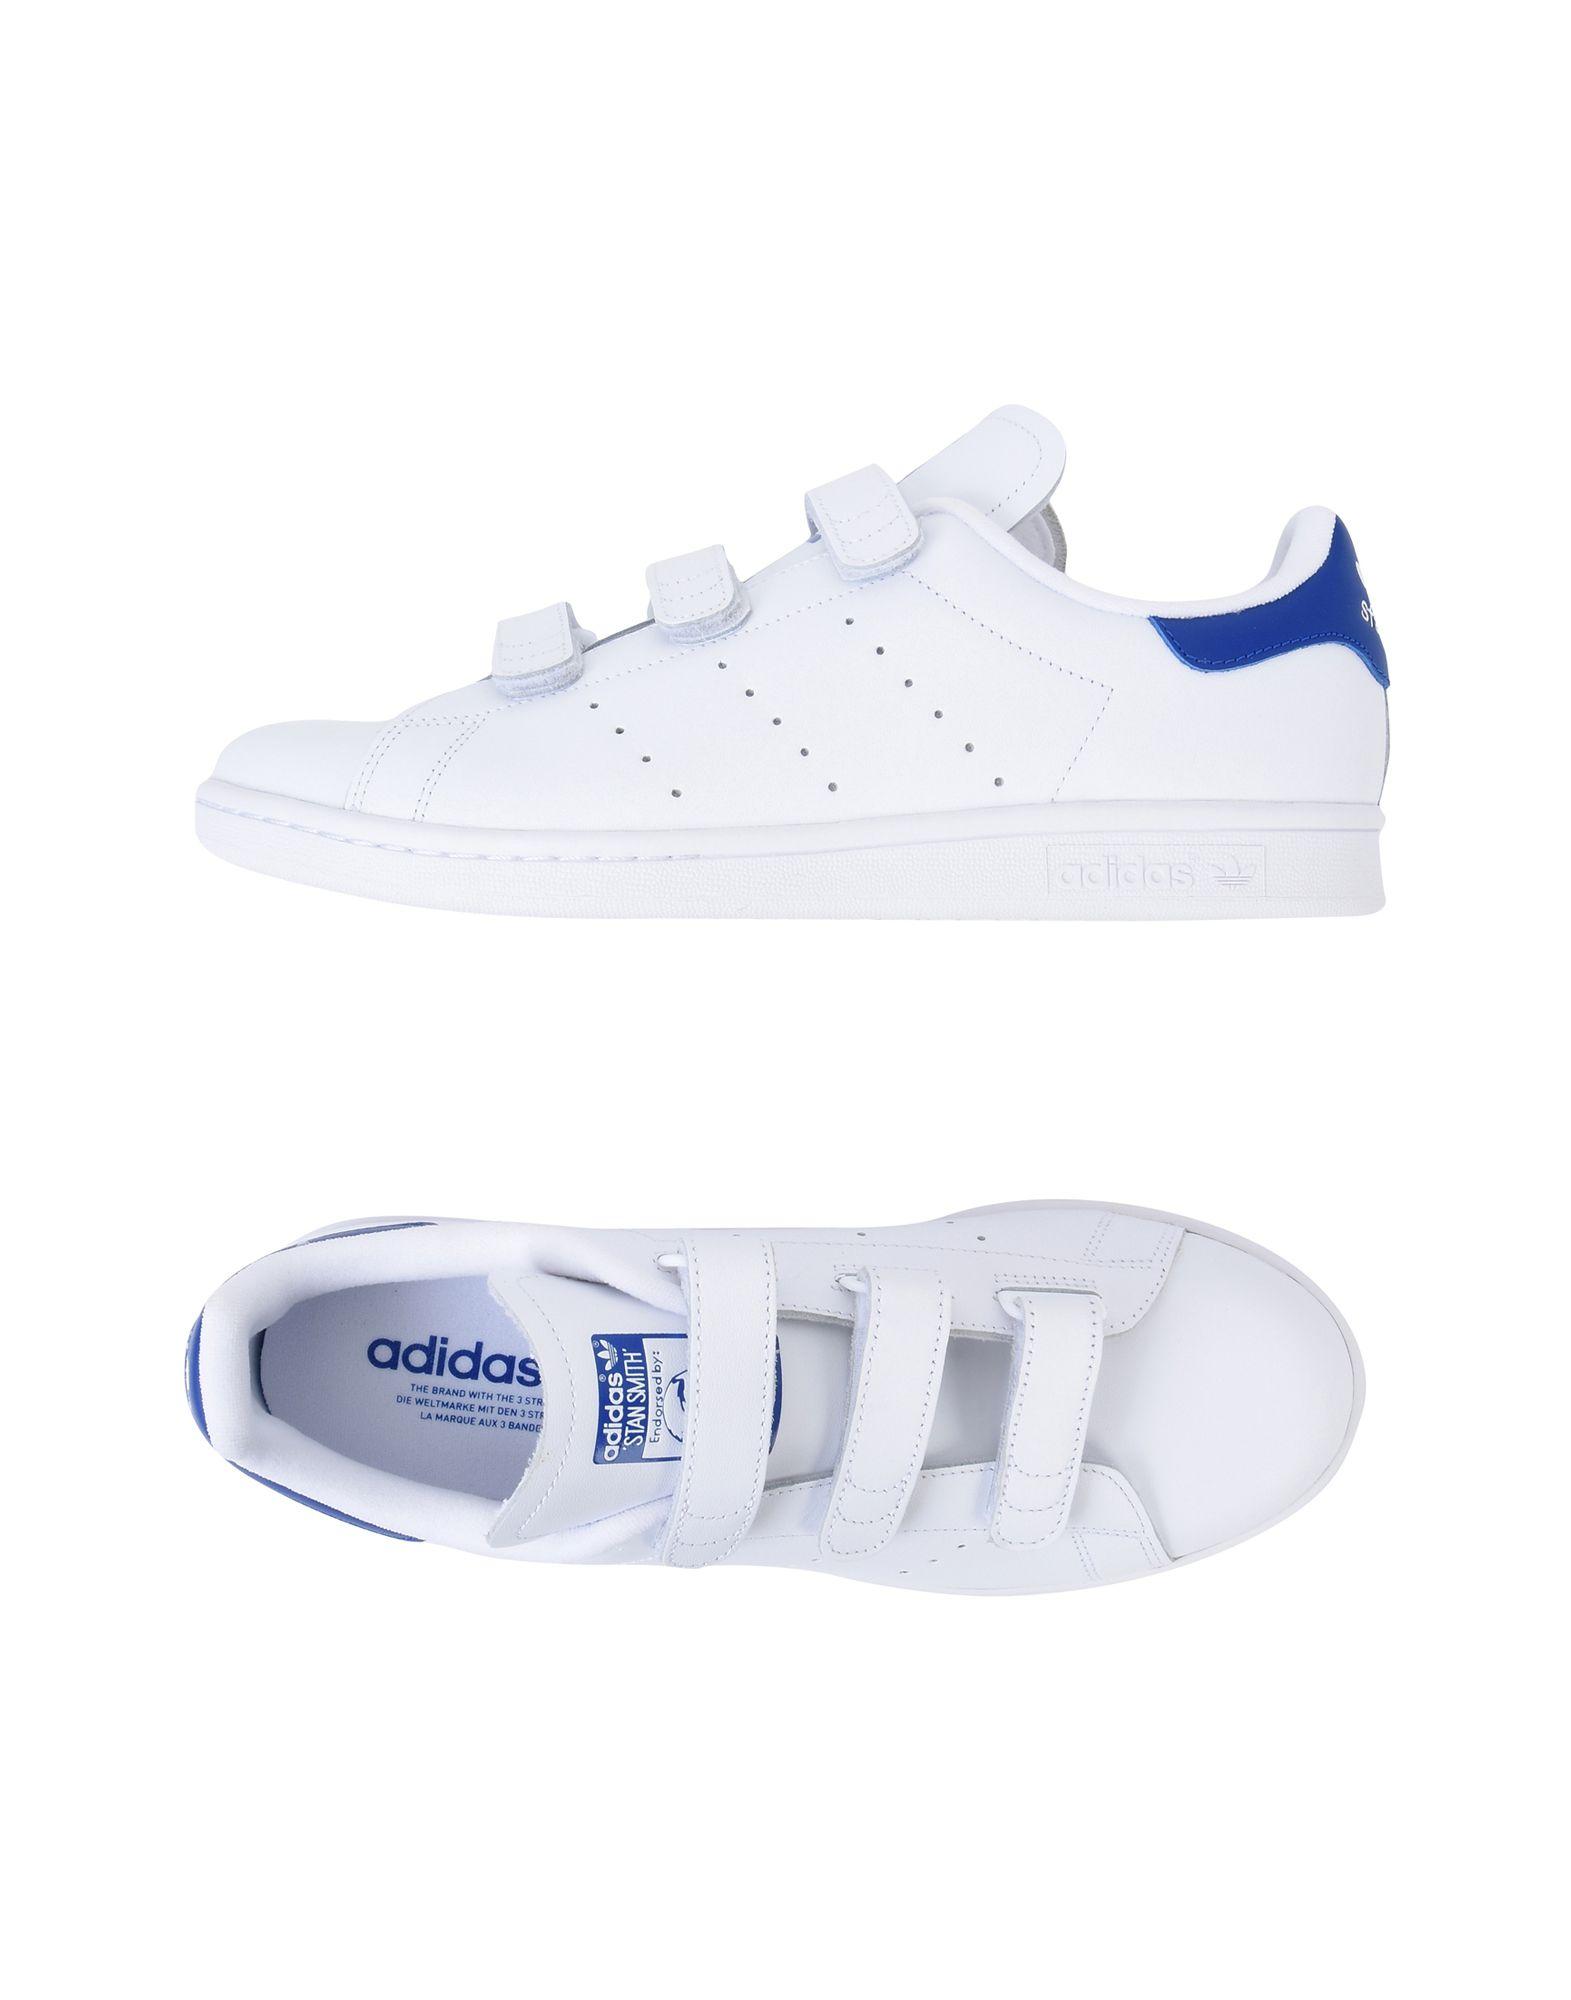 ADIDAS ORIGINALS Низкие кеды и кроссовки adidas кеды stan smith w page 4